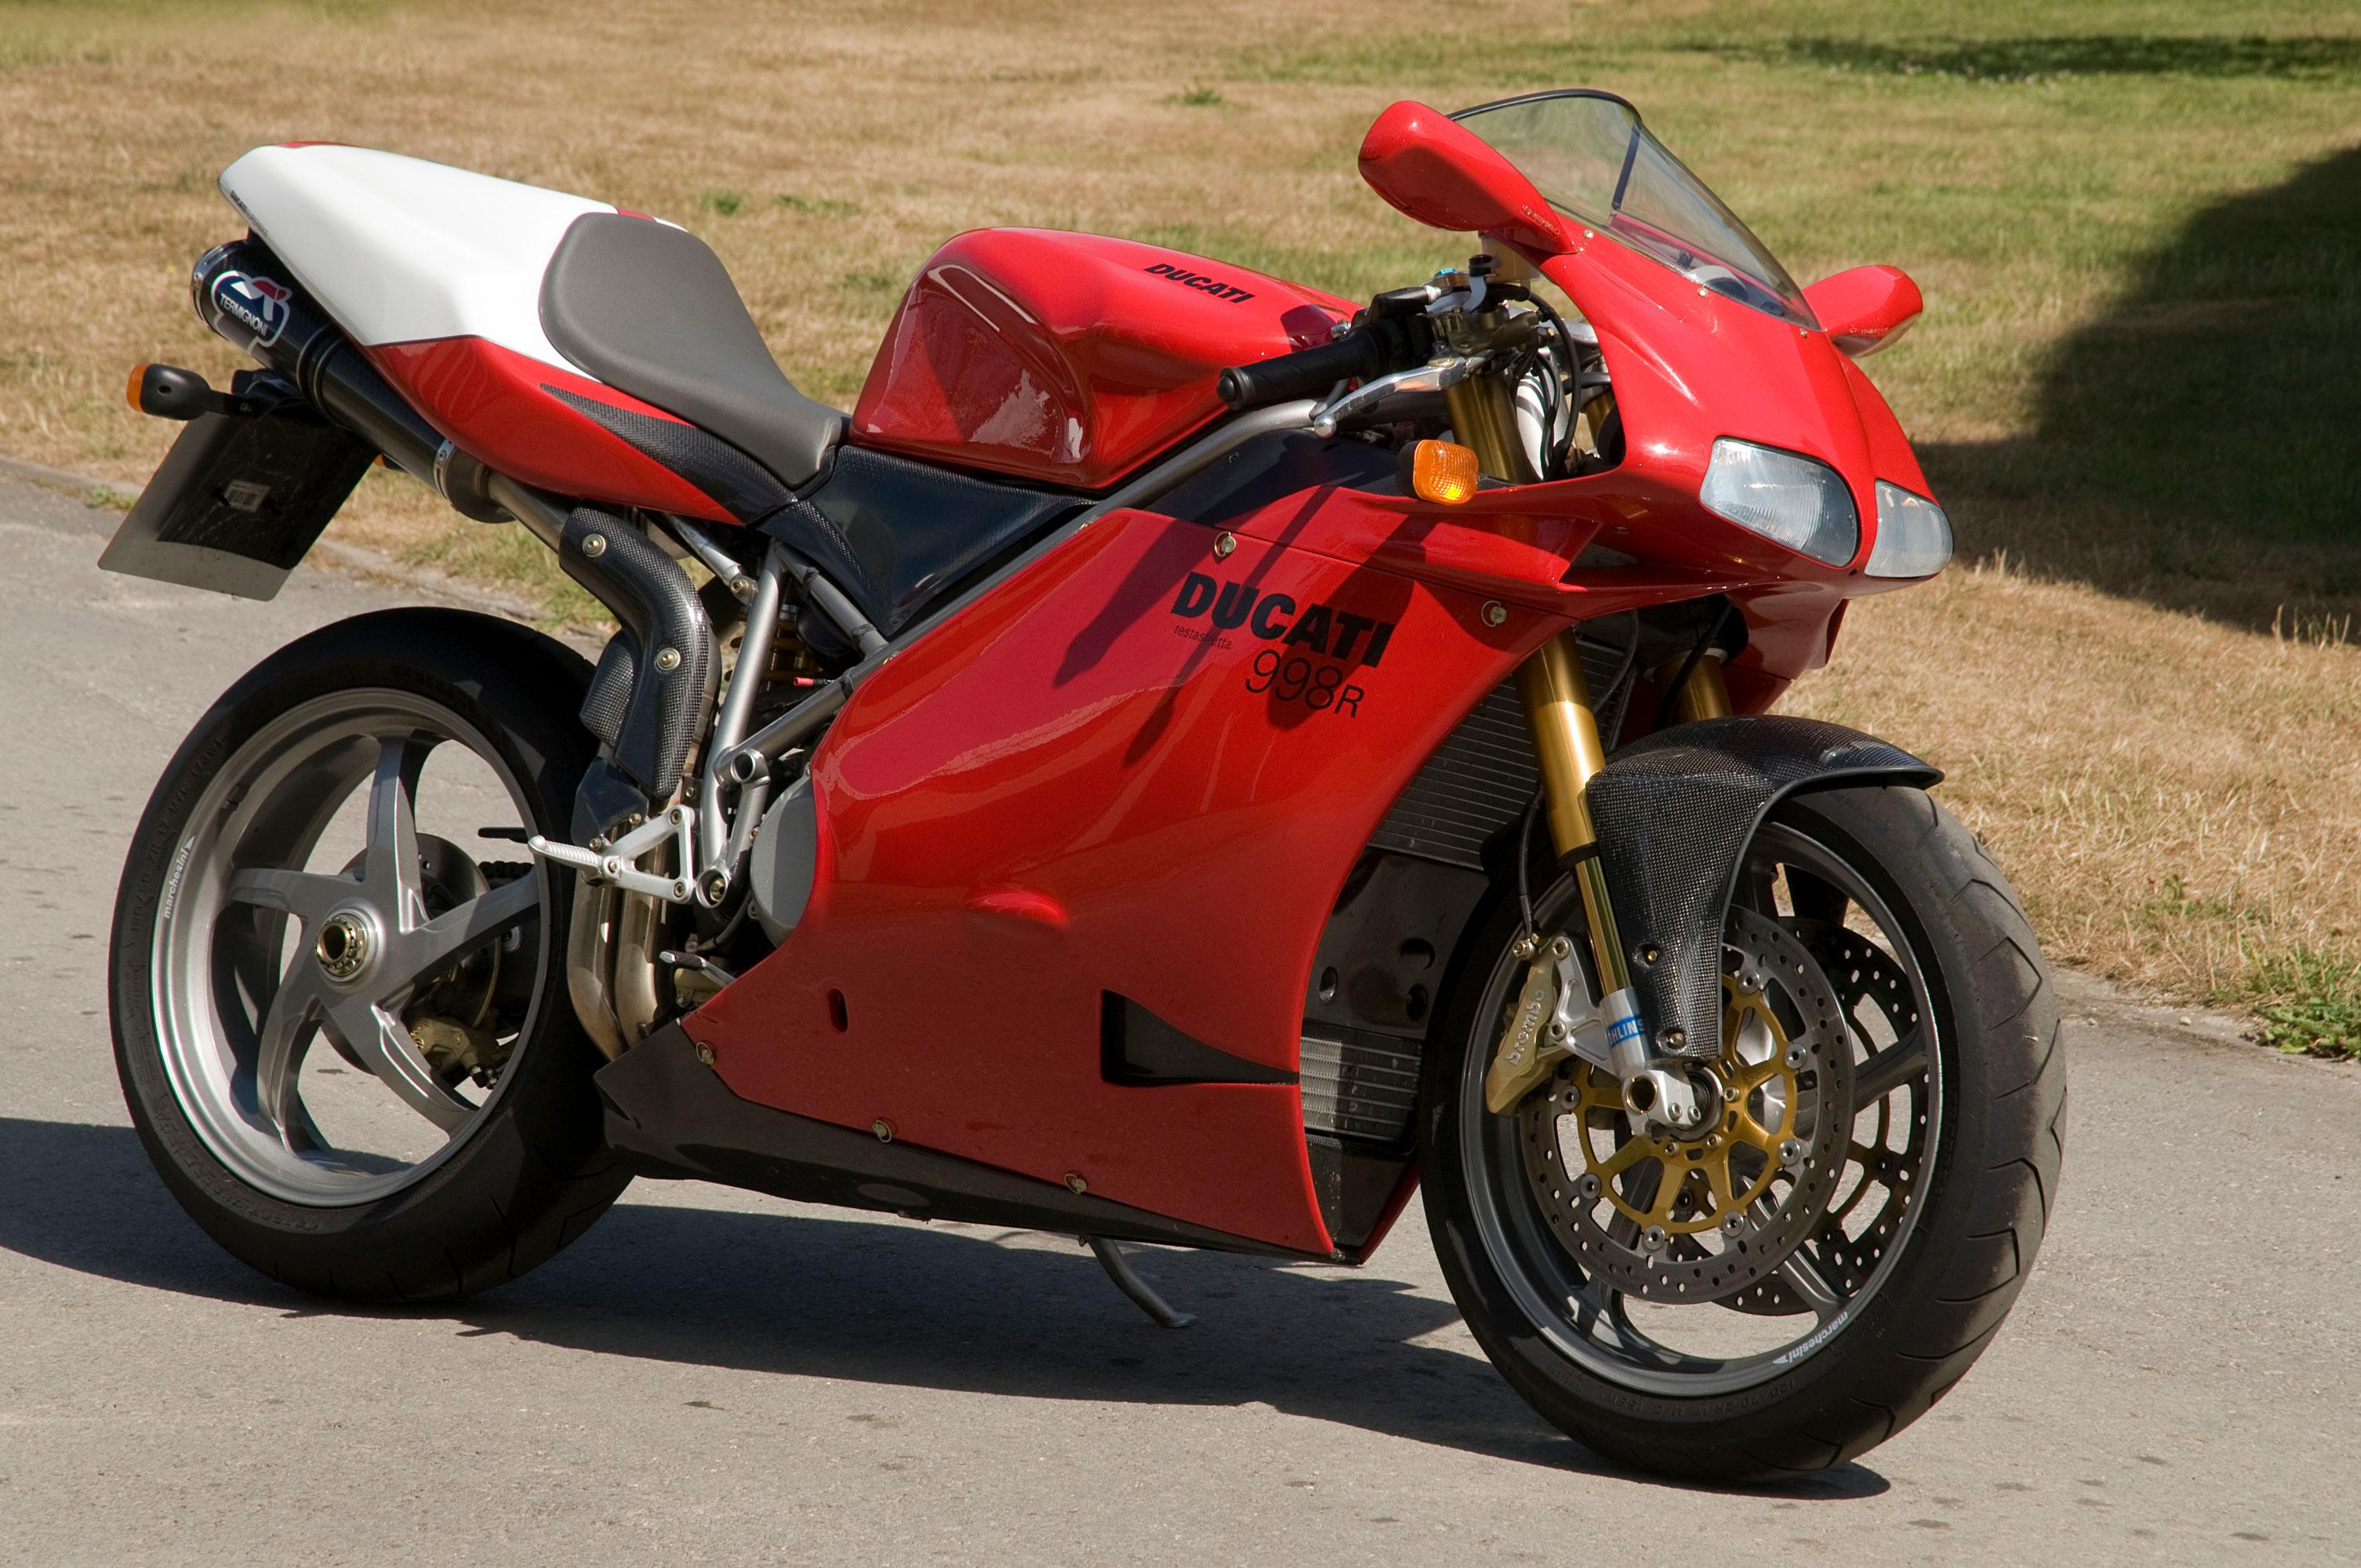 Ducati 998R - The National Motor Museum Trust